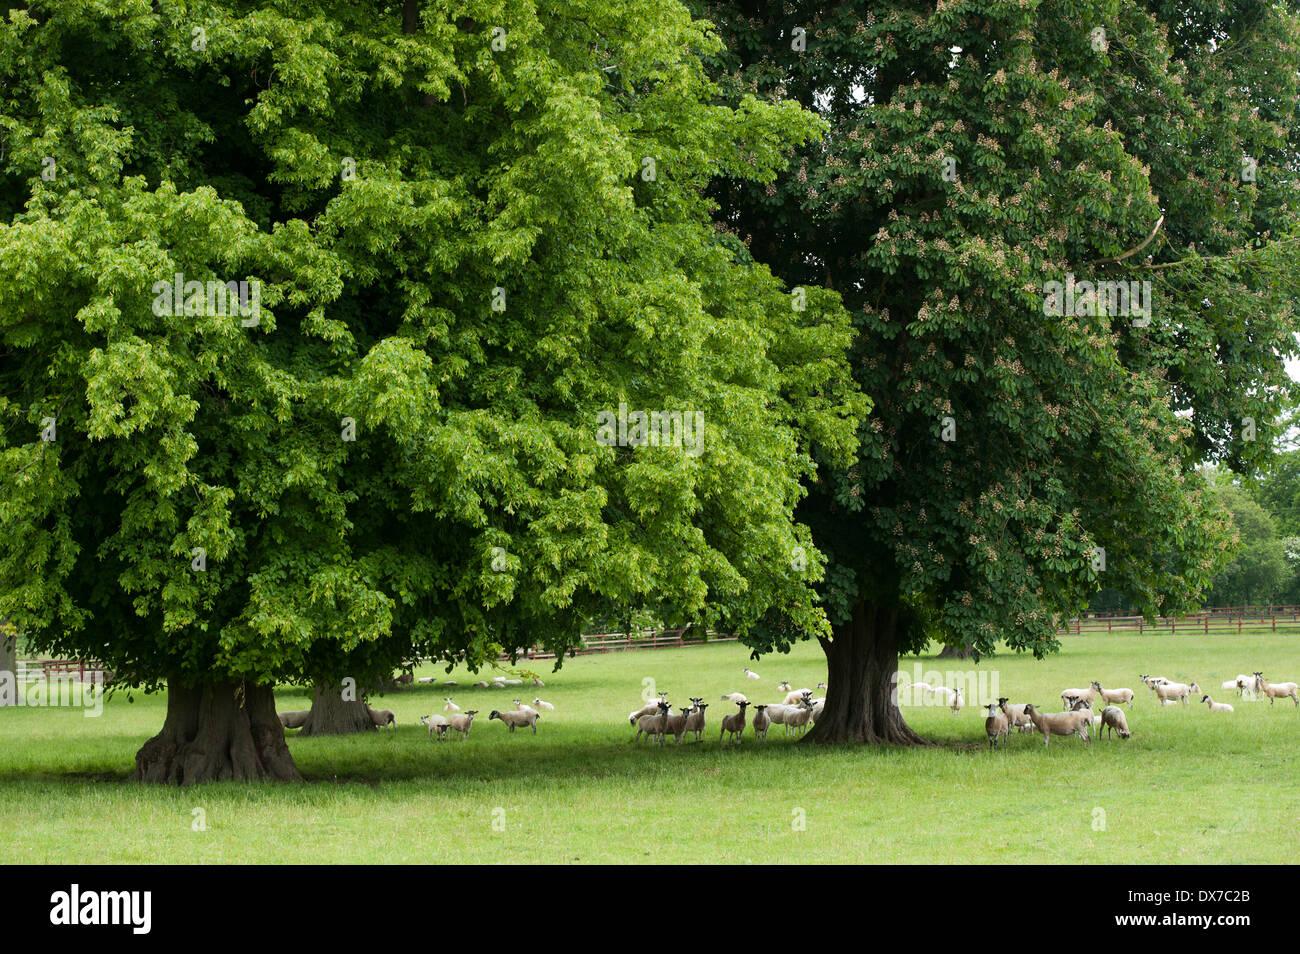 Flock of sheep in mature parkland, Newmarket, UK - Stock Image